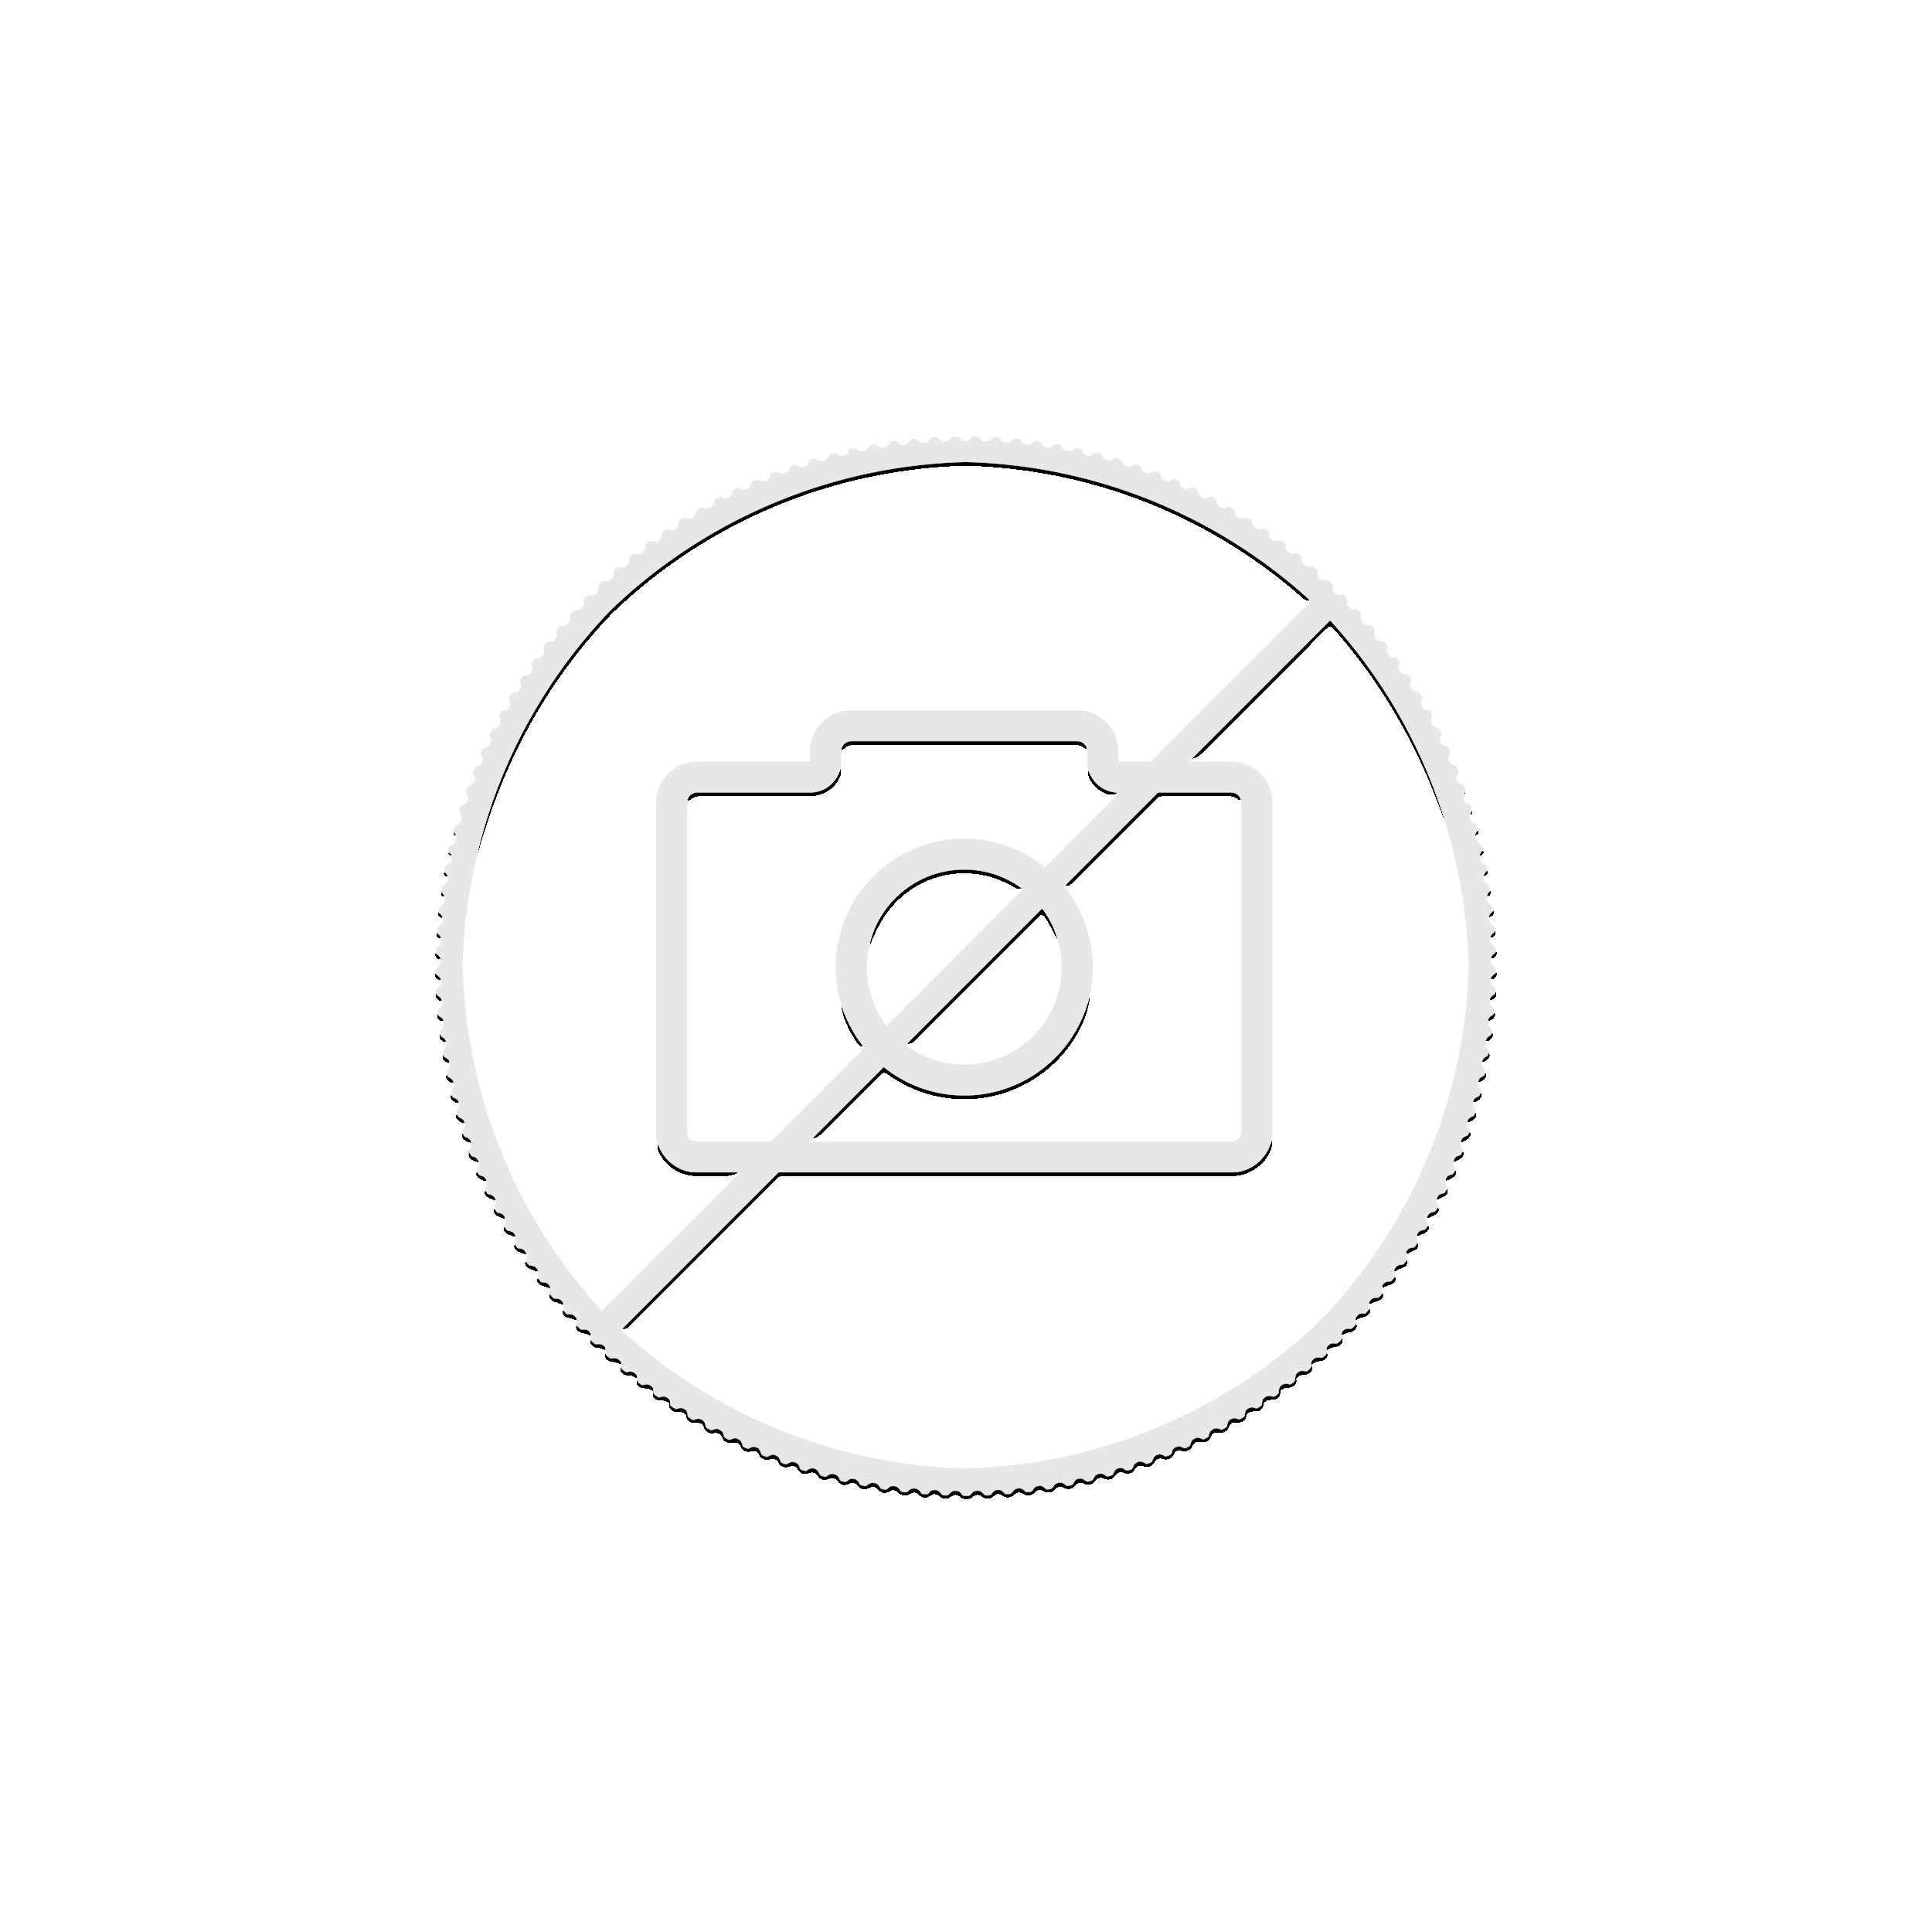 1/10 troy ounce gold coin Britannia 2022